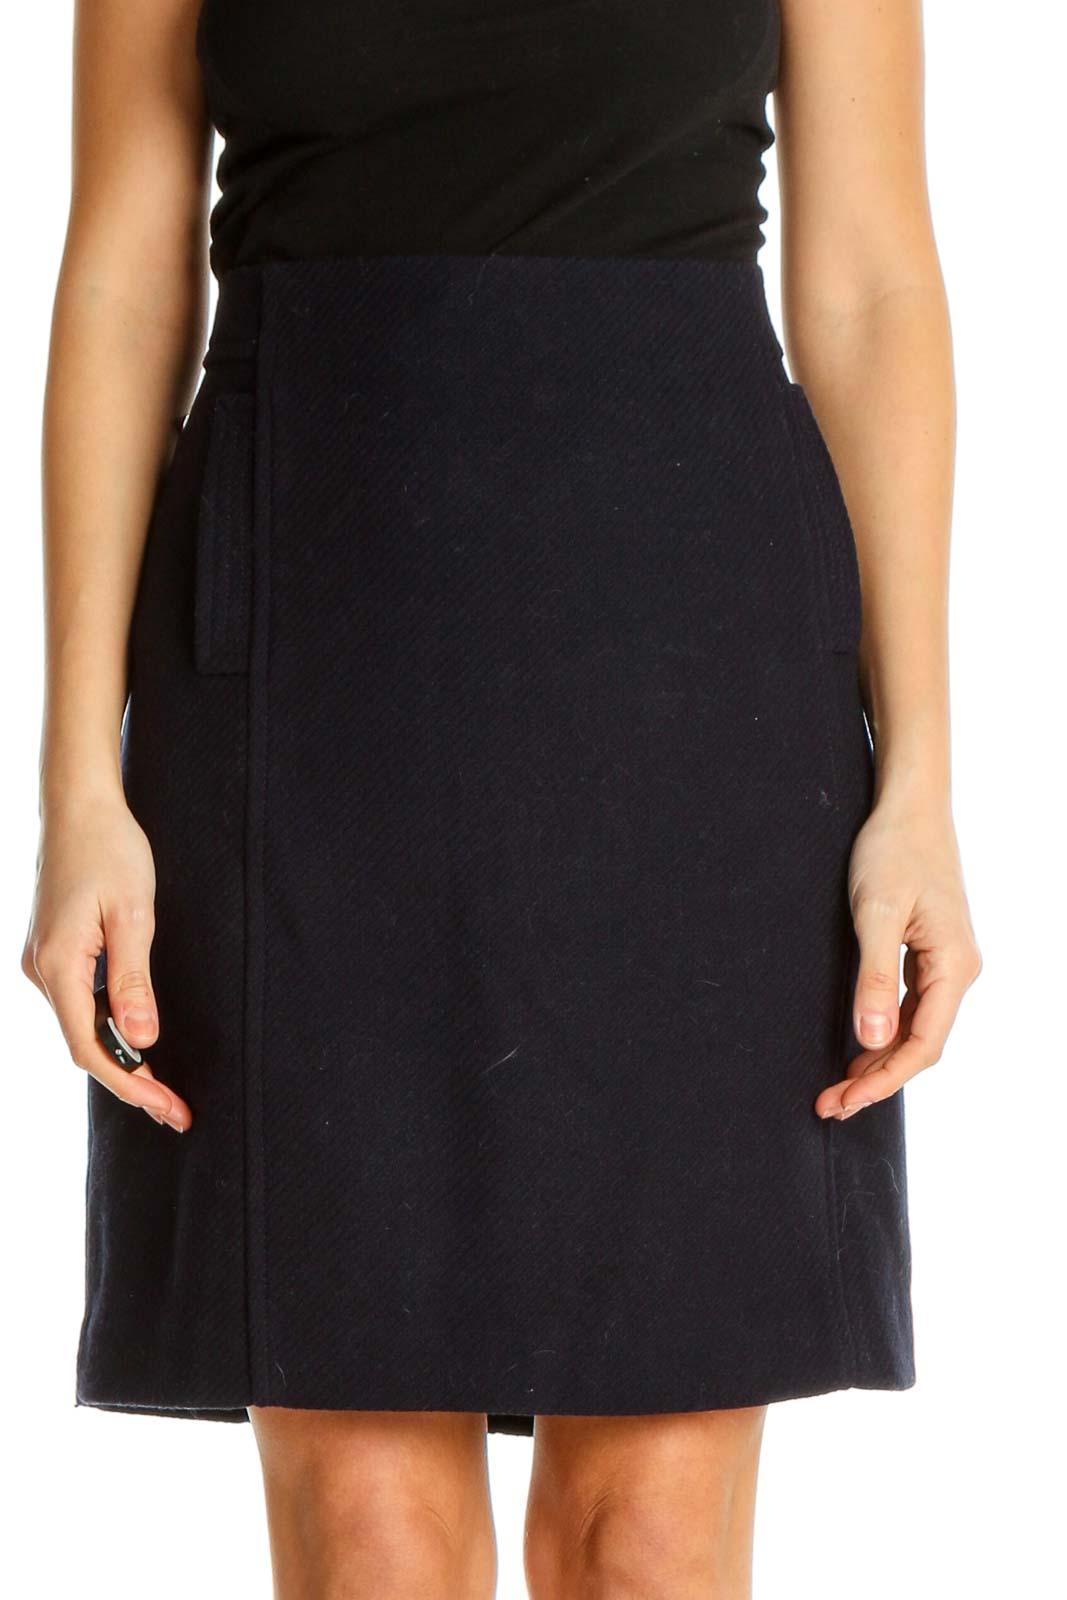 Black Colorblock Brunch A-Line Skirt Front